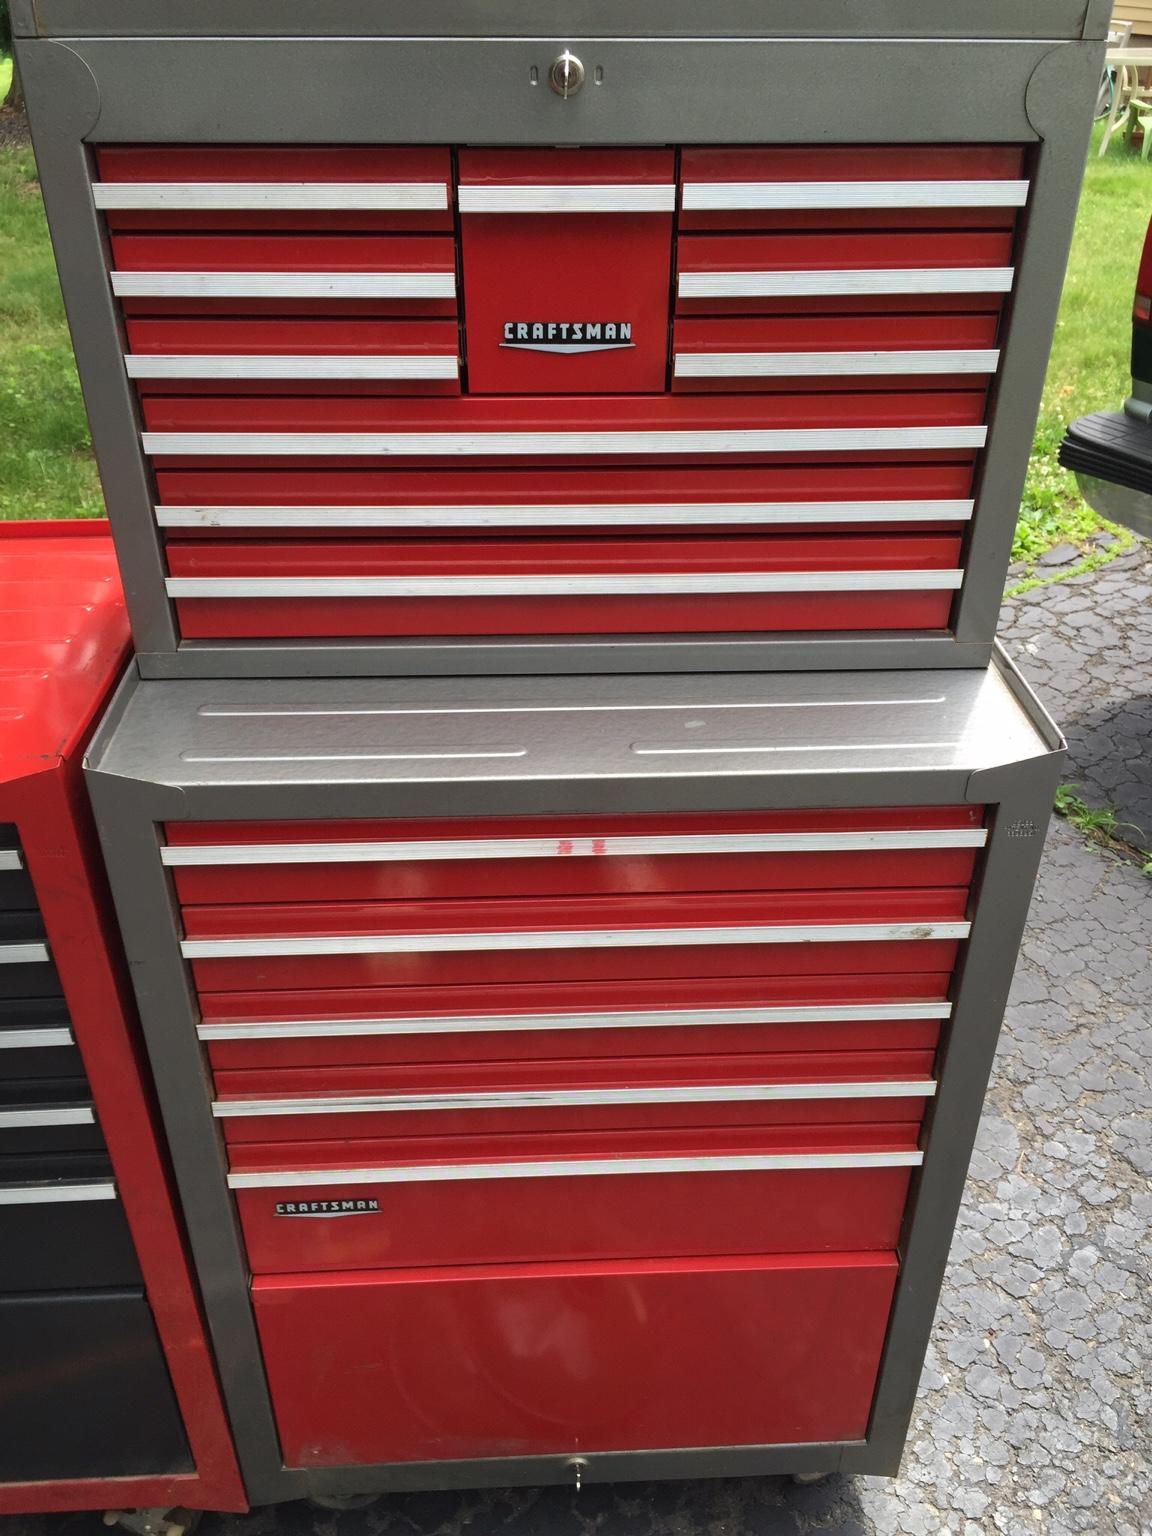 Sears Craftsman Tool Storage Cabinet Designs